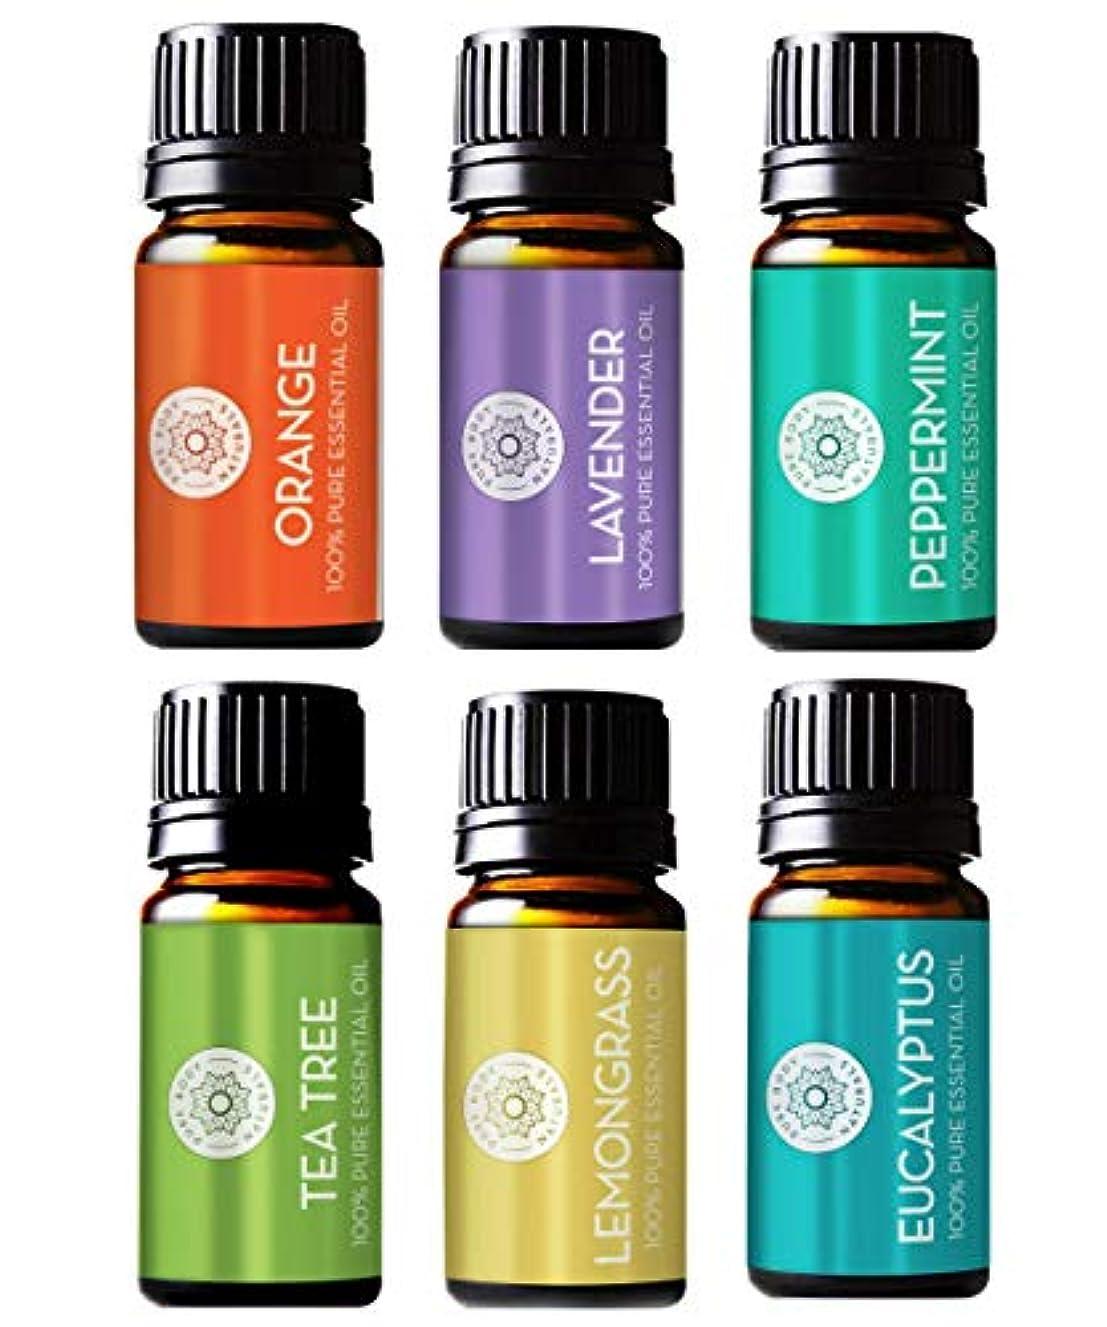 Pure Body Natural Essential Oils Set, 100% Pure Aromatherapy Diffuser Oils, Sample Kit for Beginners, Lavender, Tea Tree, Eucalyptus, Lemongrass, Orange, Peppermint - 10 Milliliter (6 Count)